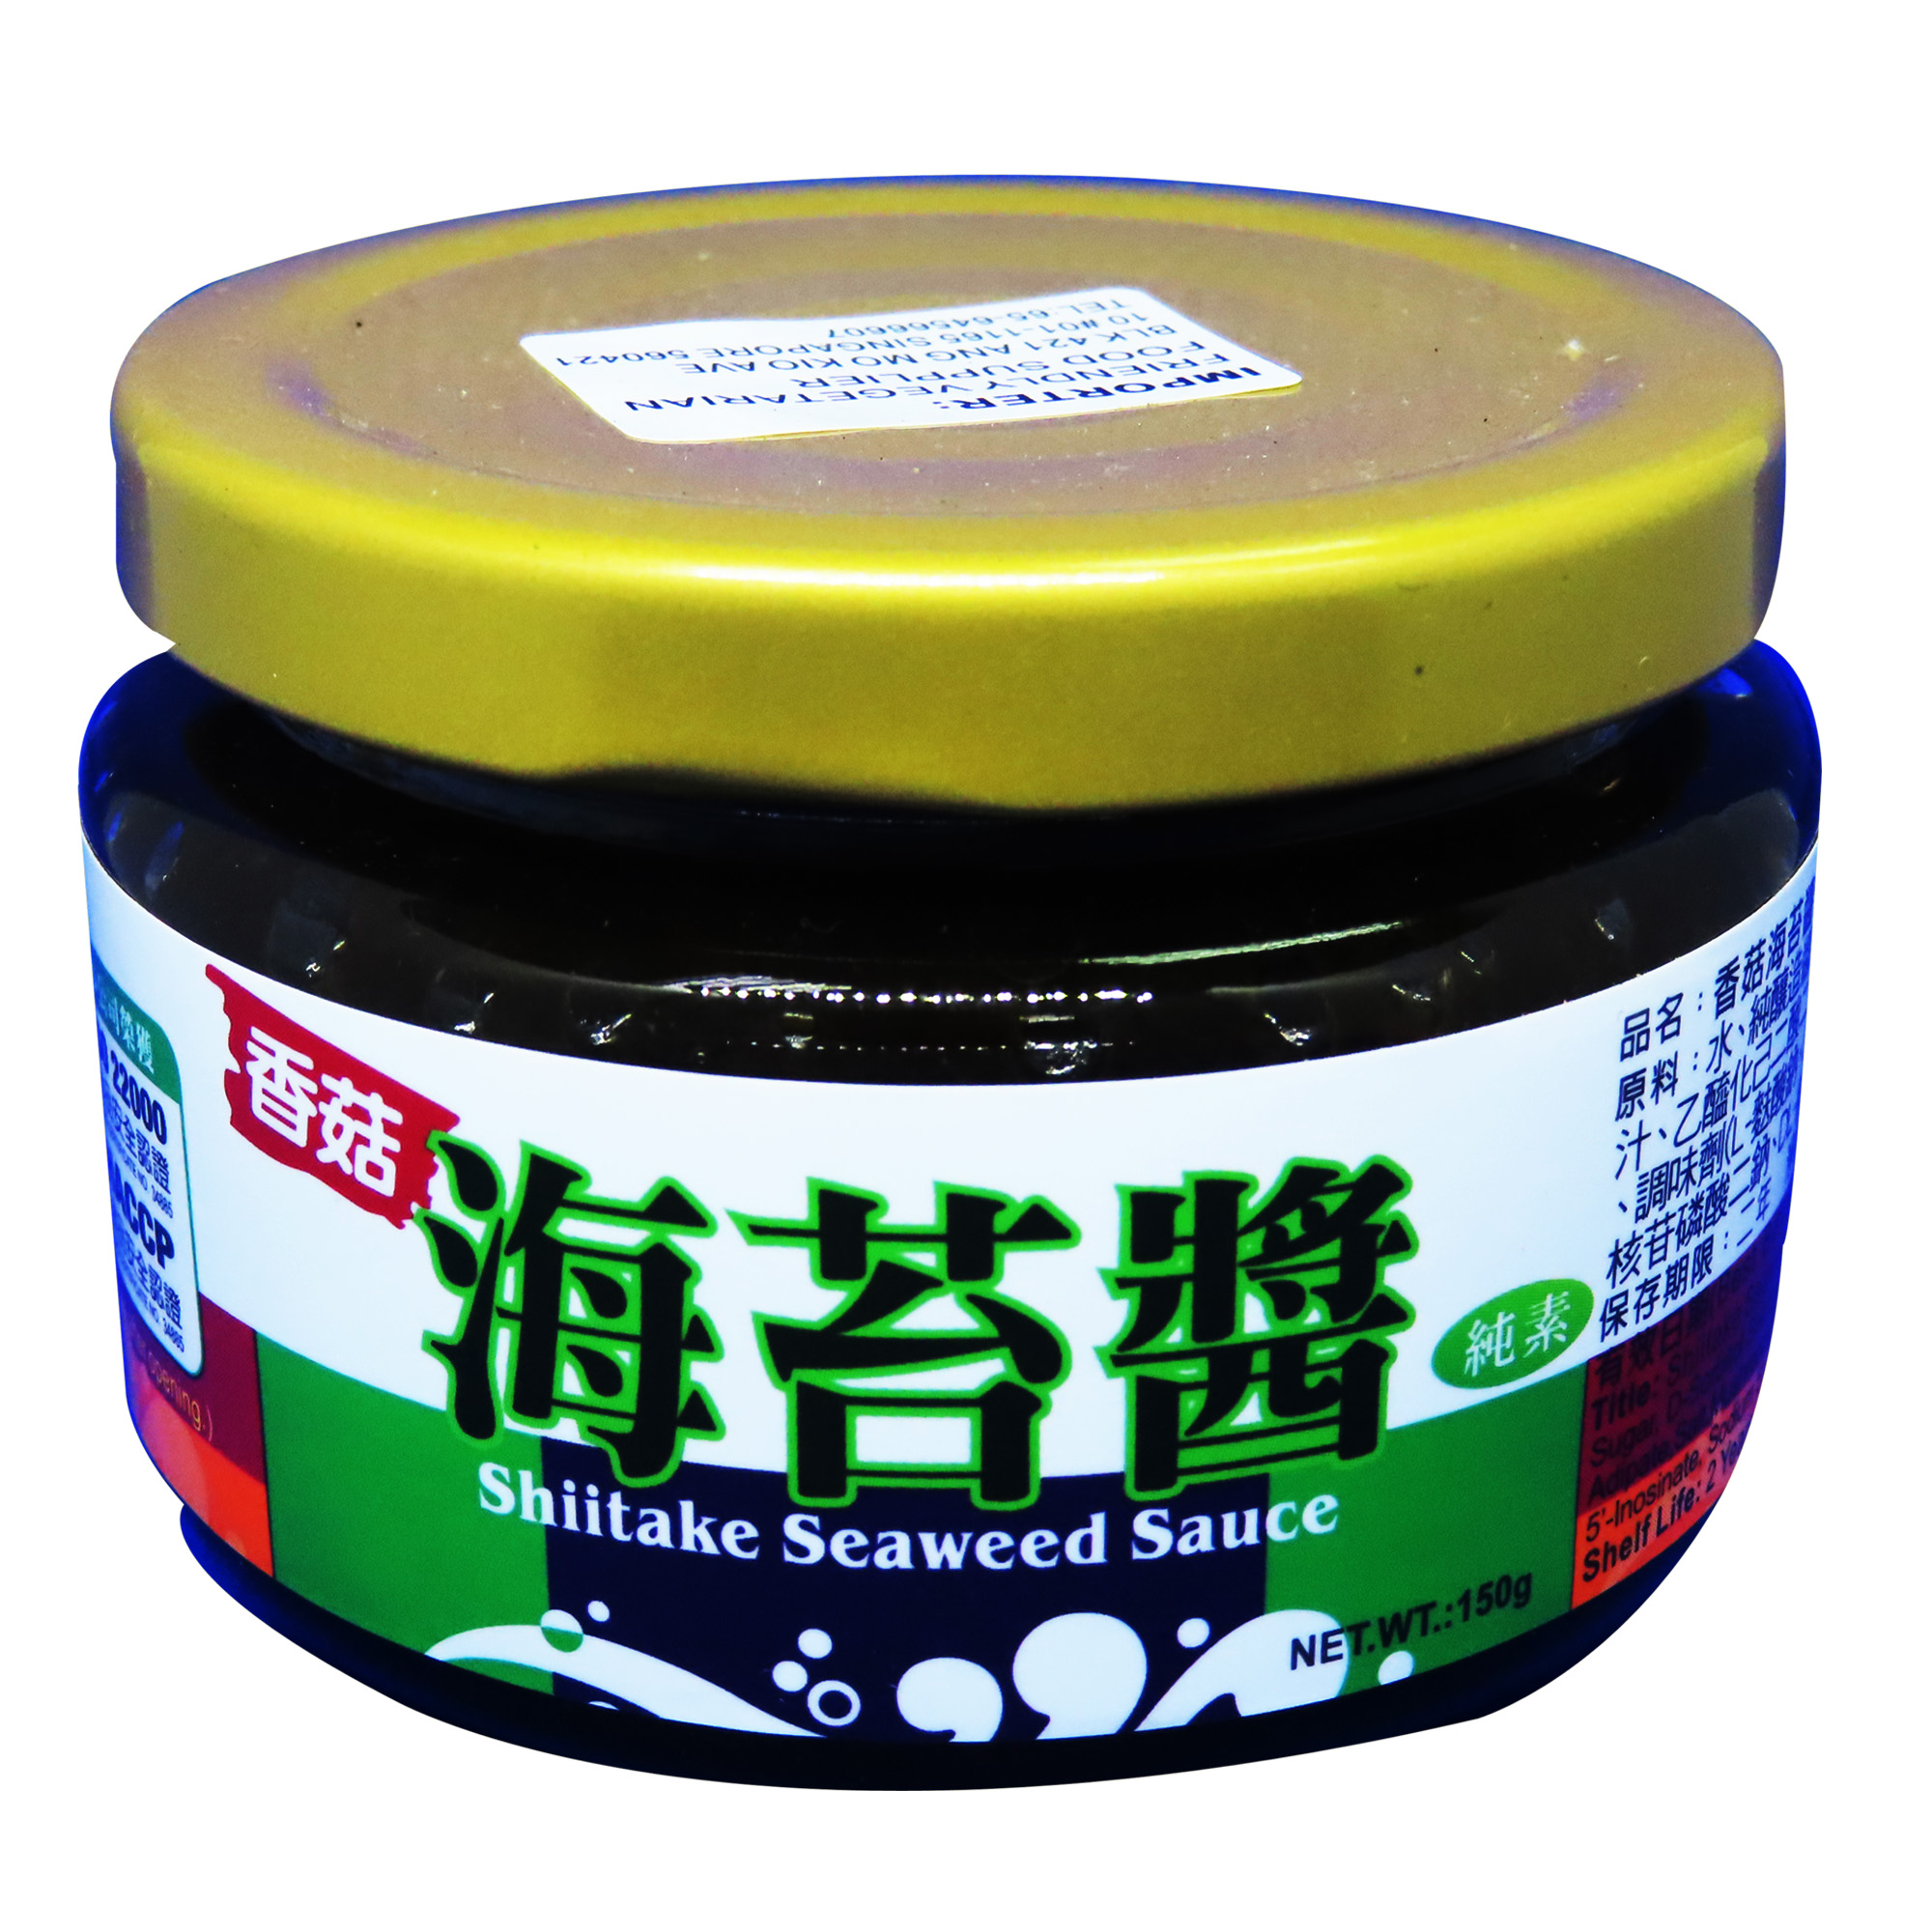 Image Shitake Seaweed Sauce 菇王 - 香菇海苔酱 150grams